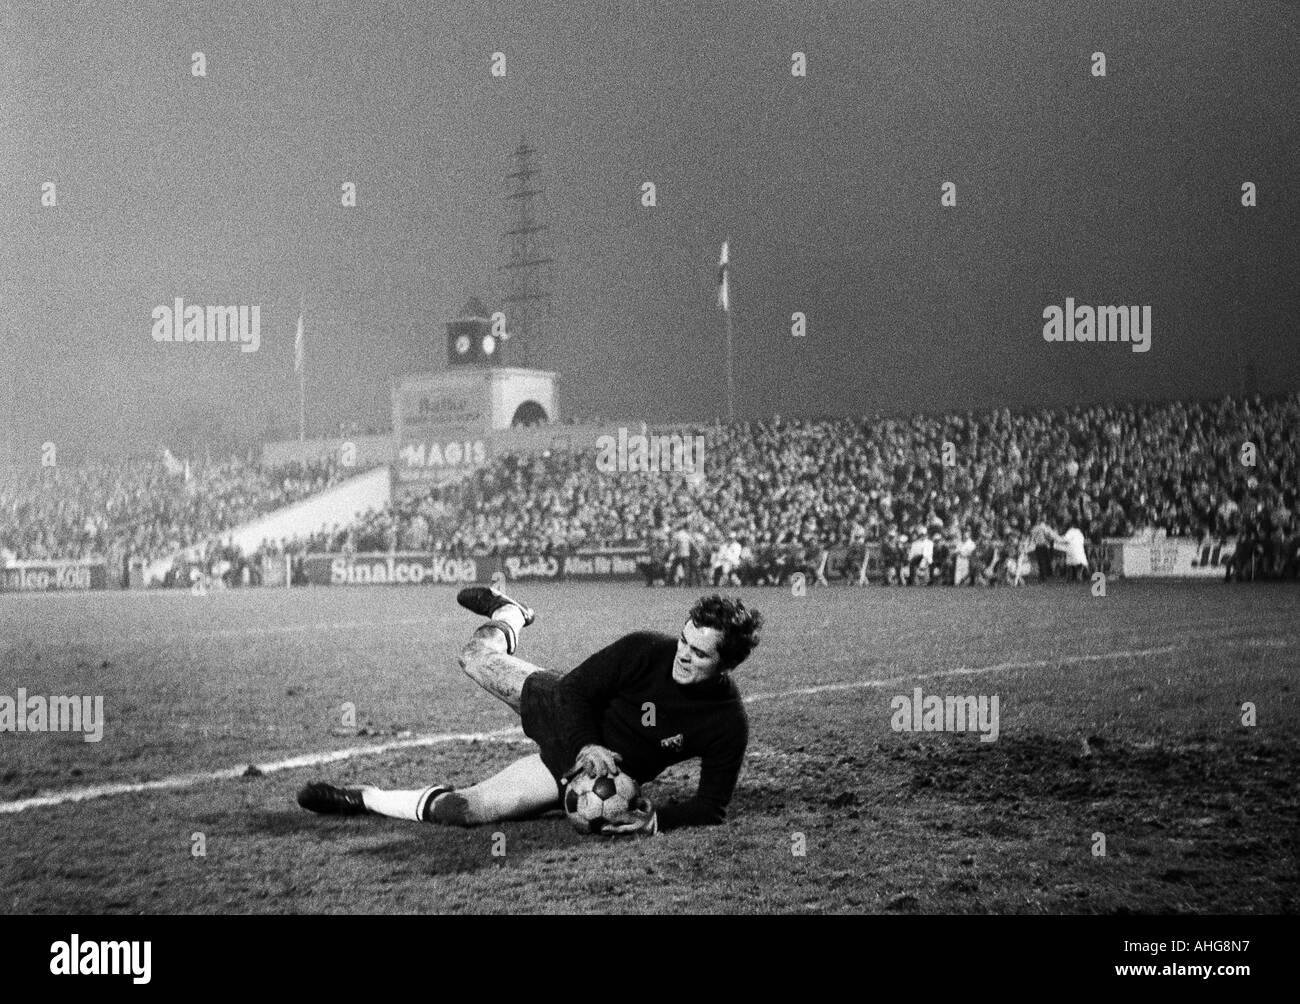 football, Bundesliga, 1969/1970, Rot-Weiss Oberhausen versus Borussia Moenchengladbach 3:4, Niederrhein Stadium in Oberhausen, scene of the match, save by keeper Volker Danner (Gladbach) - Stock Image